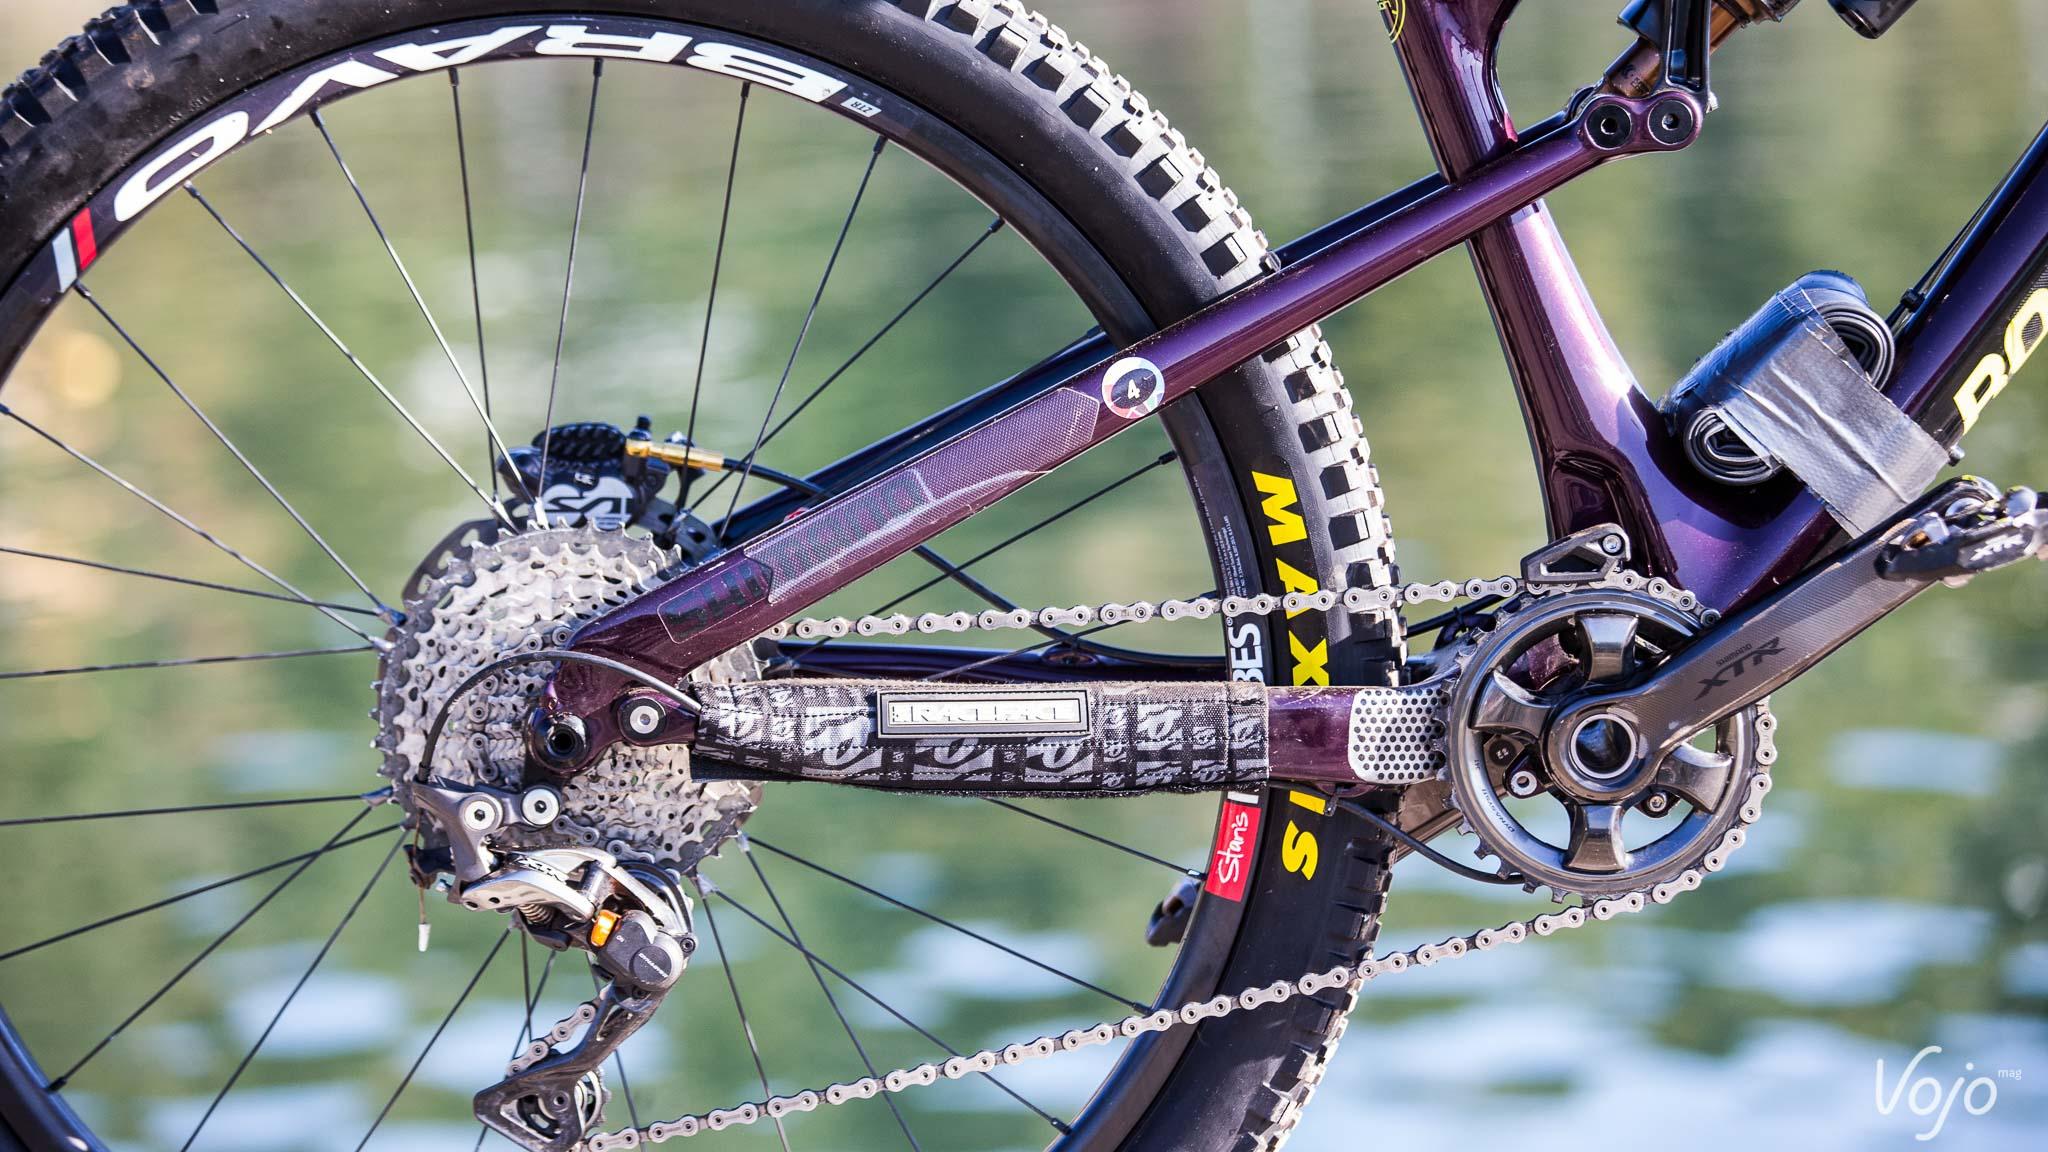 Florian_Nicolai_Rocky_Mountain_Altitude_Bikecheck_Copyright_OBeart_VojoMag-1-2